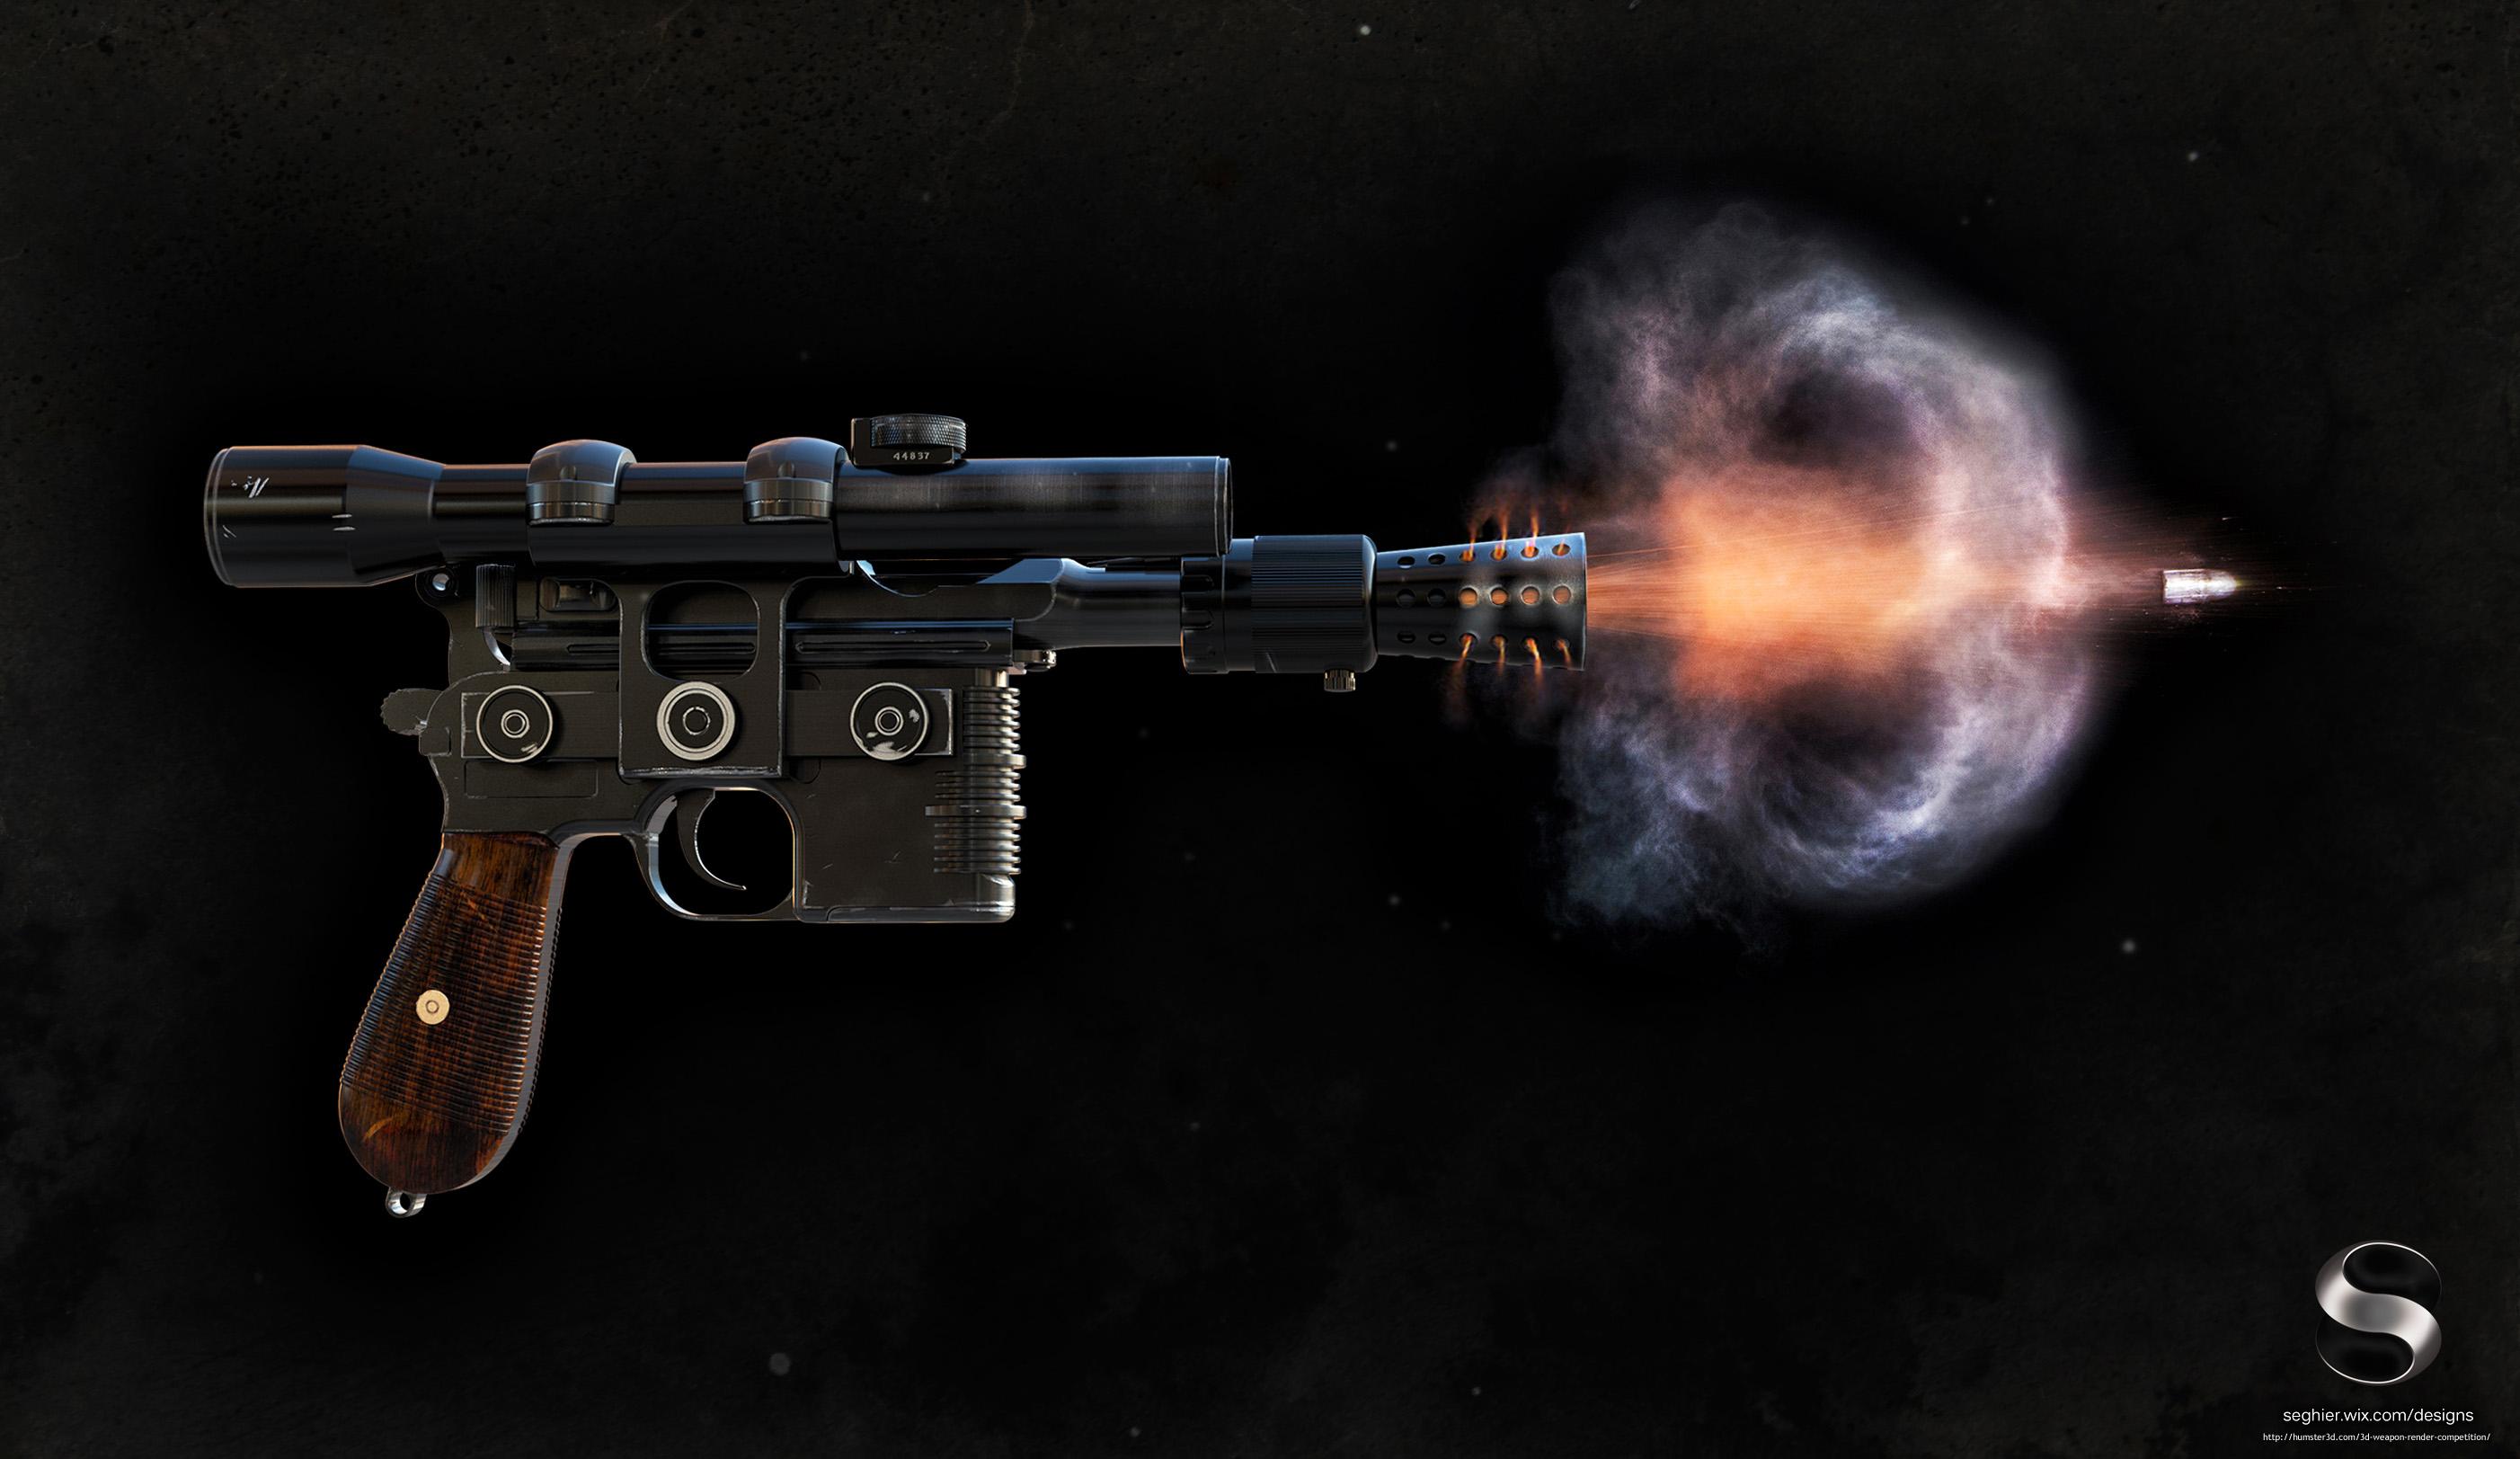 Han Solo´s DL-44 Blaster 3d art